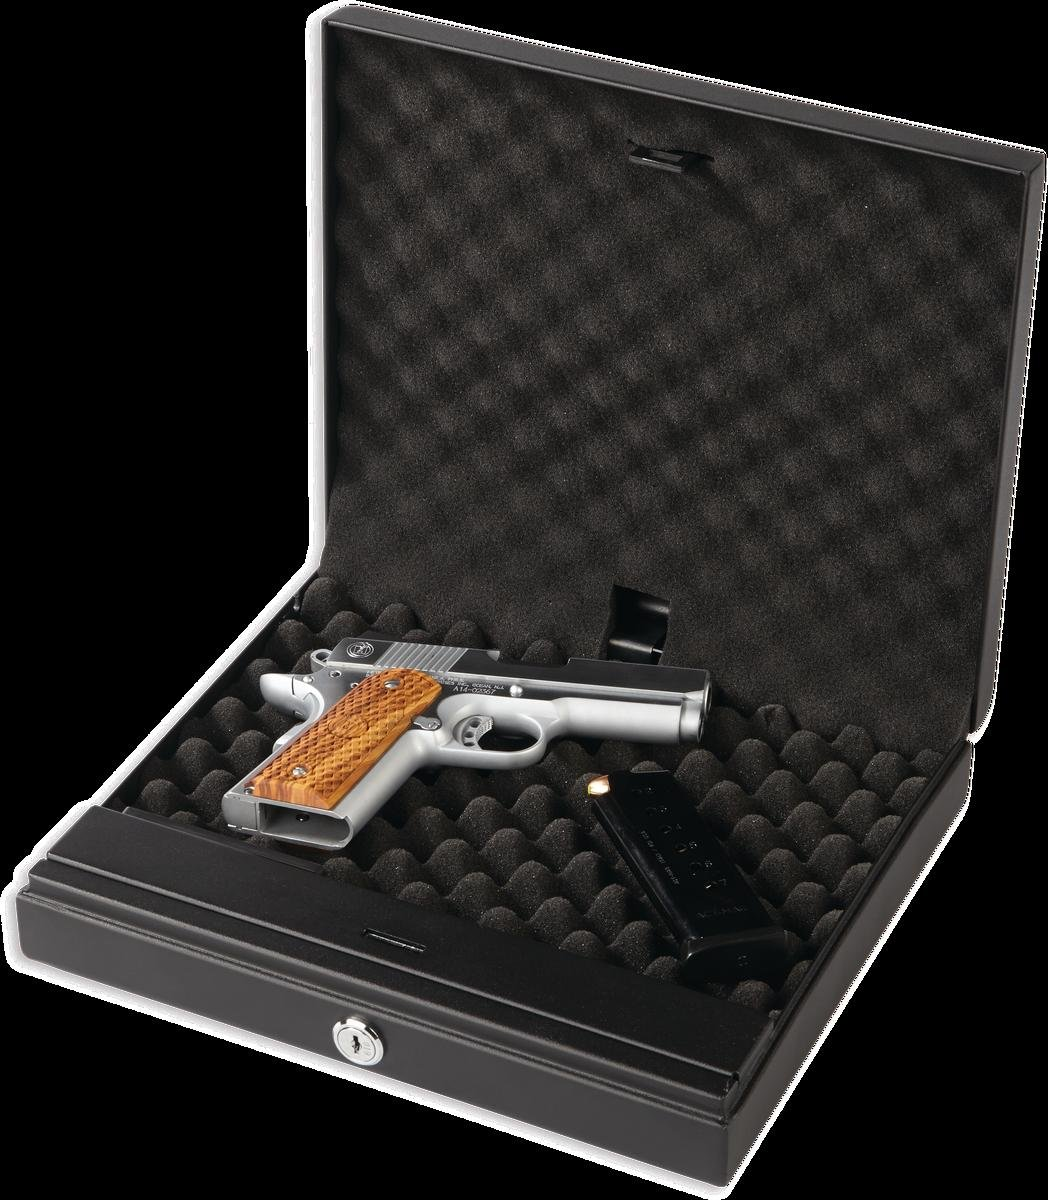 Bulldog Vaults Magnum Biometric Top Load Pistol Vault Black, 11.5 x 9.8 x 2.5'' by Bulldog Vaults (Image #4)